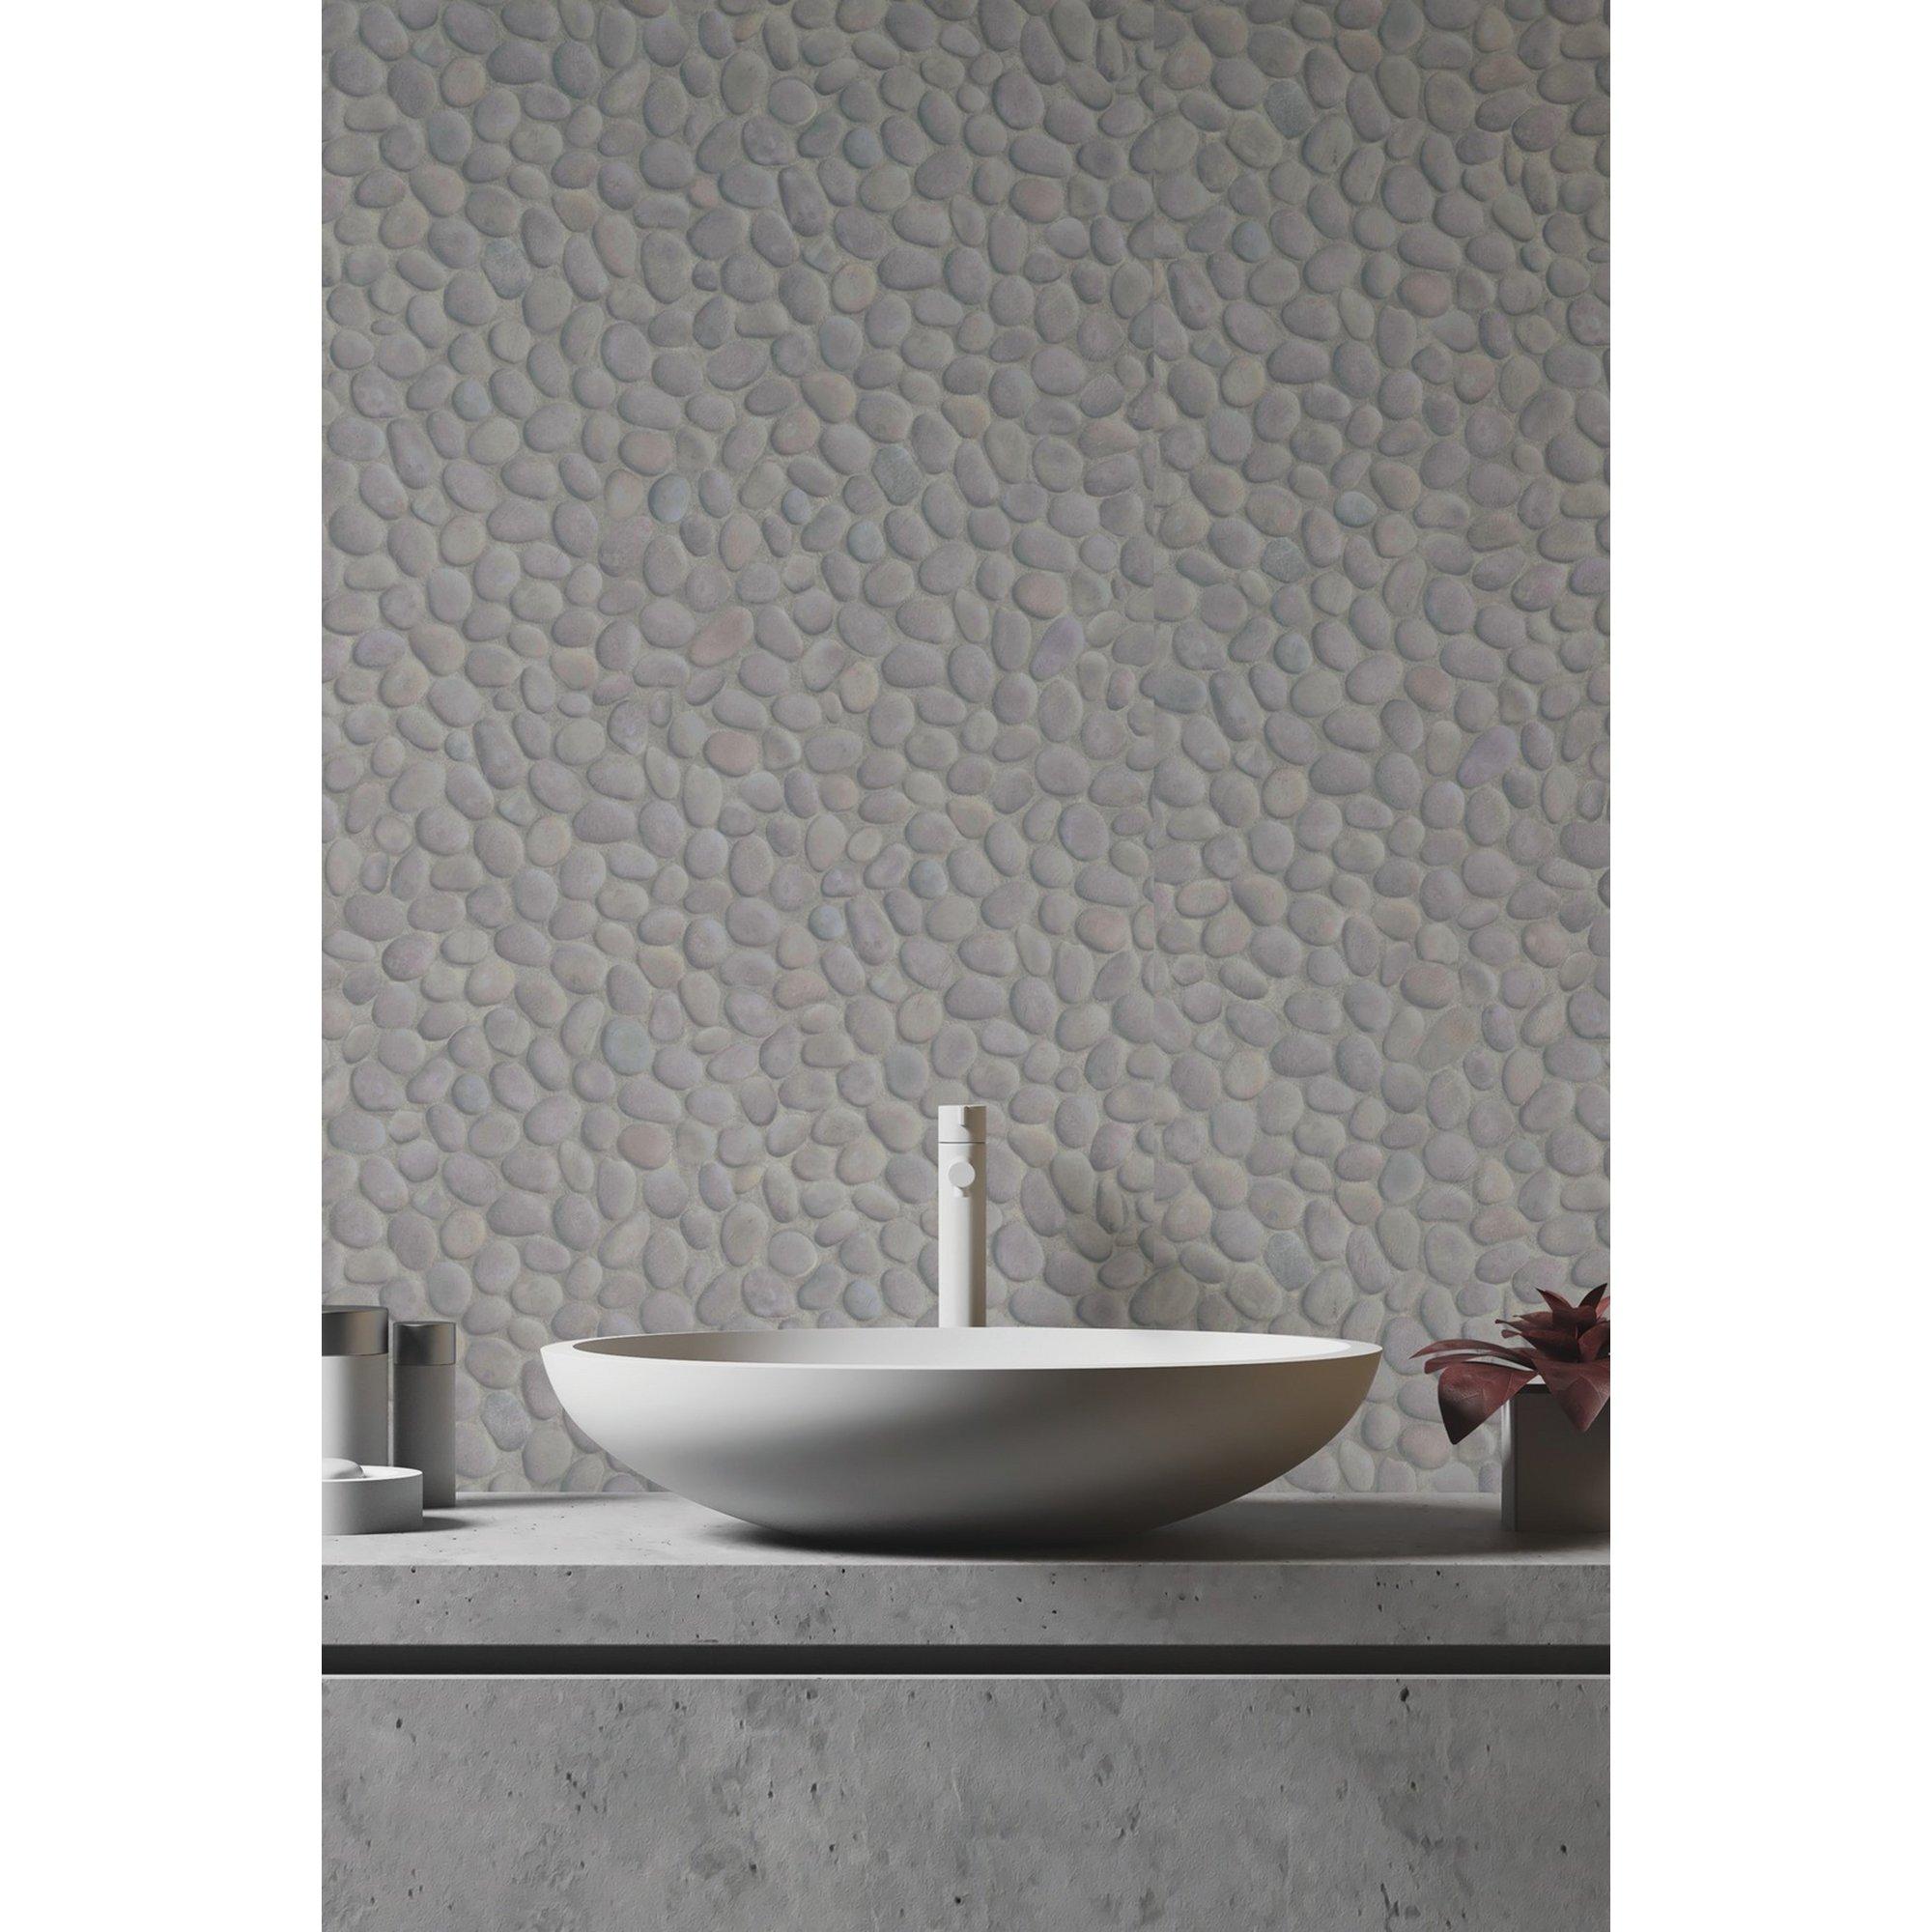 Image of D-C-Fix 3D Wallpaper for Splashbacks Pebbles Bato